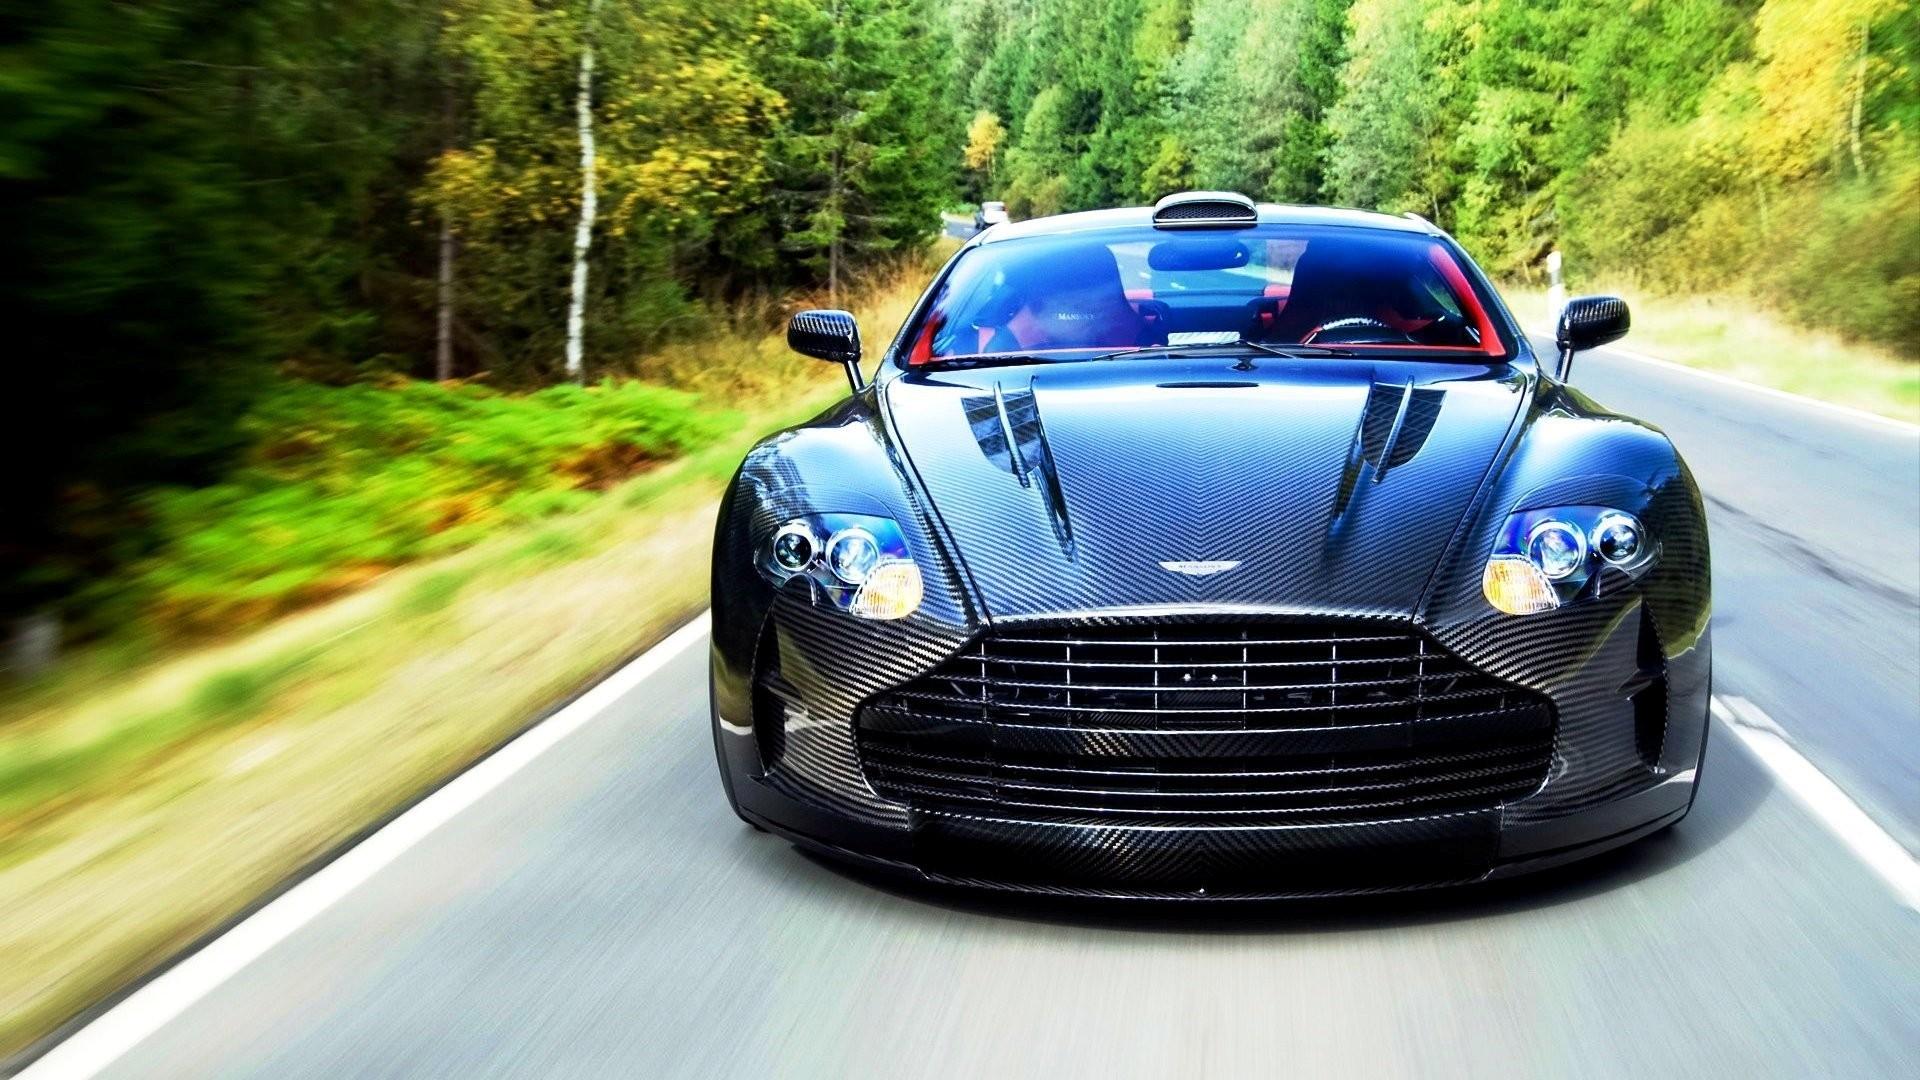 Carbon-Fiber-Aston-Martin-1920-x-1080-wallpaper-wpc5803269